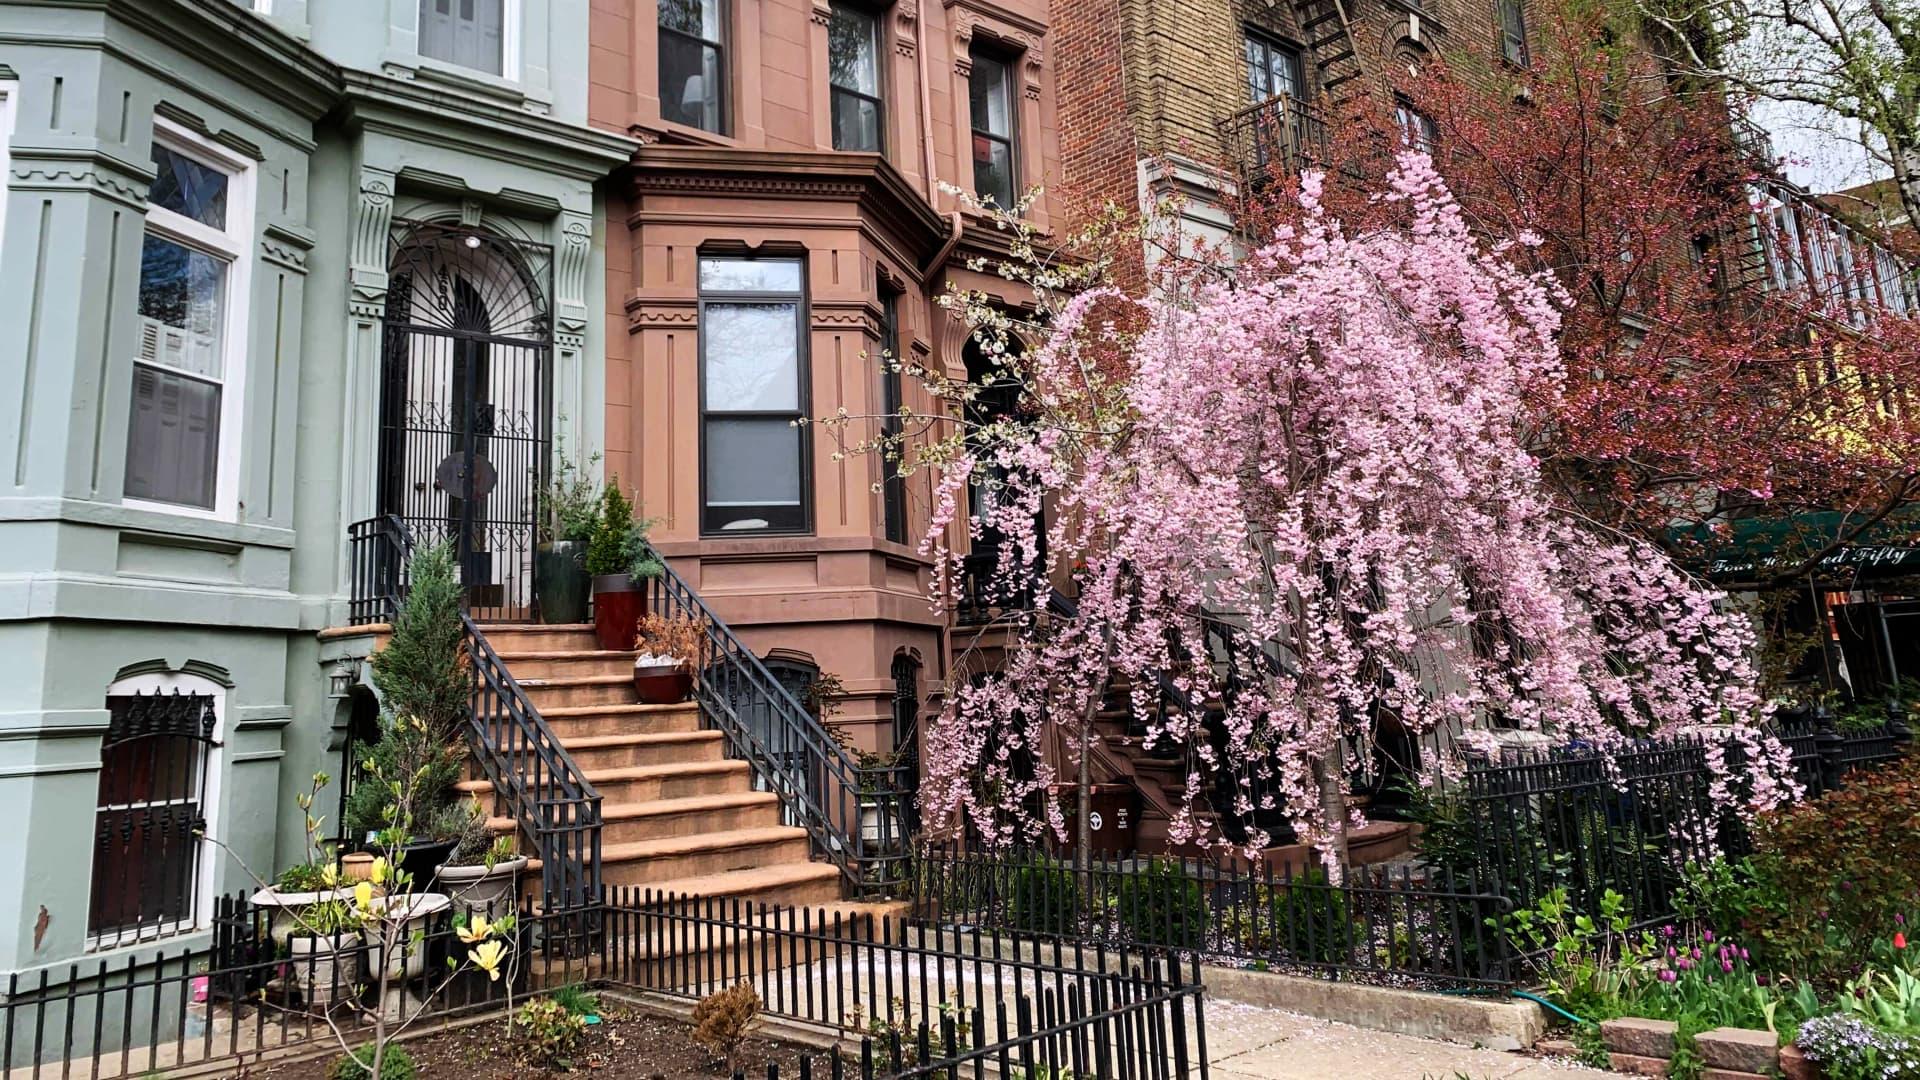 A morning walk in Brooklyn's Clinton Hill neighborhood in spring.